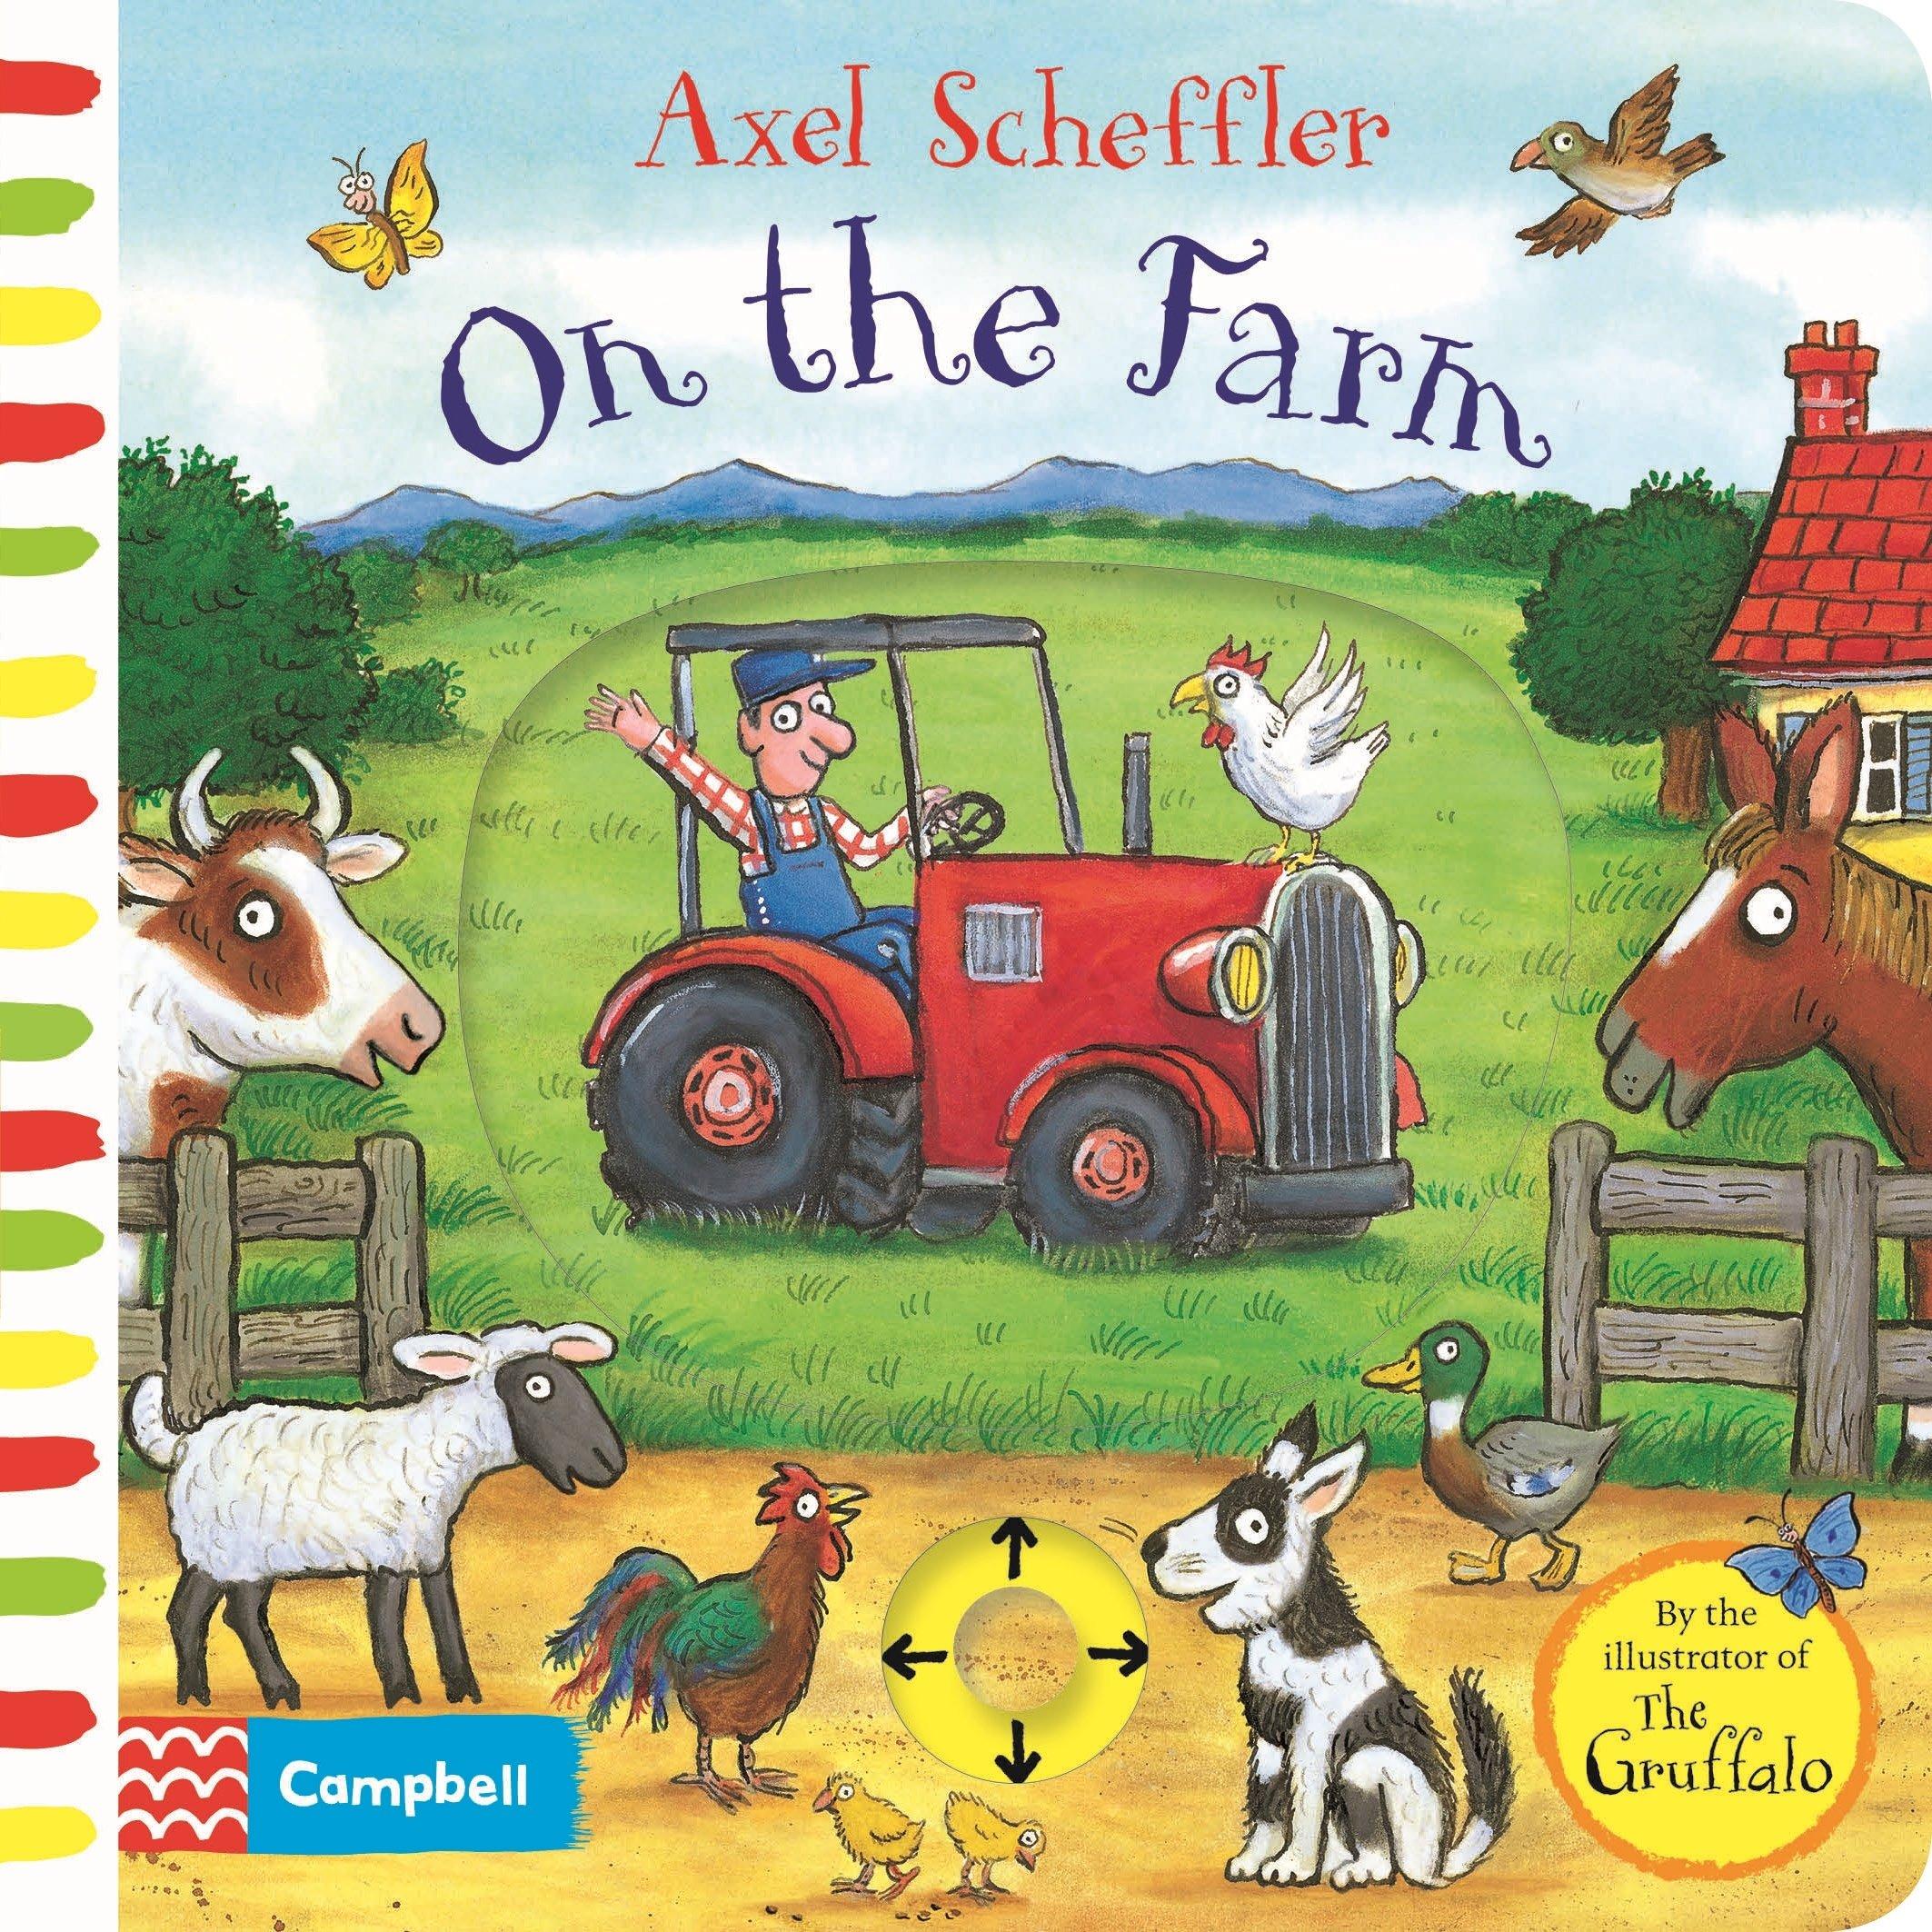 axel scheffler on the farm amazon co uk axel scheffler books